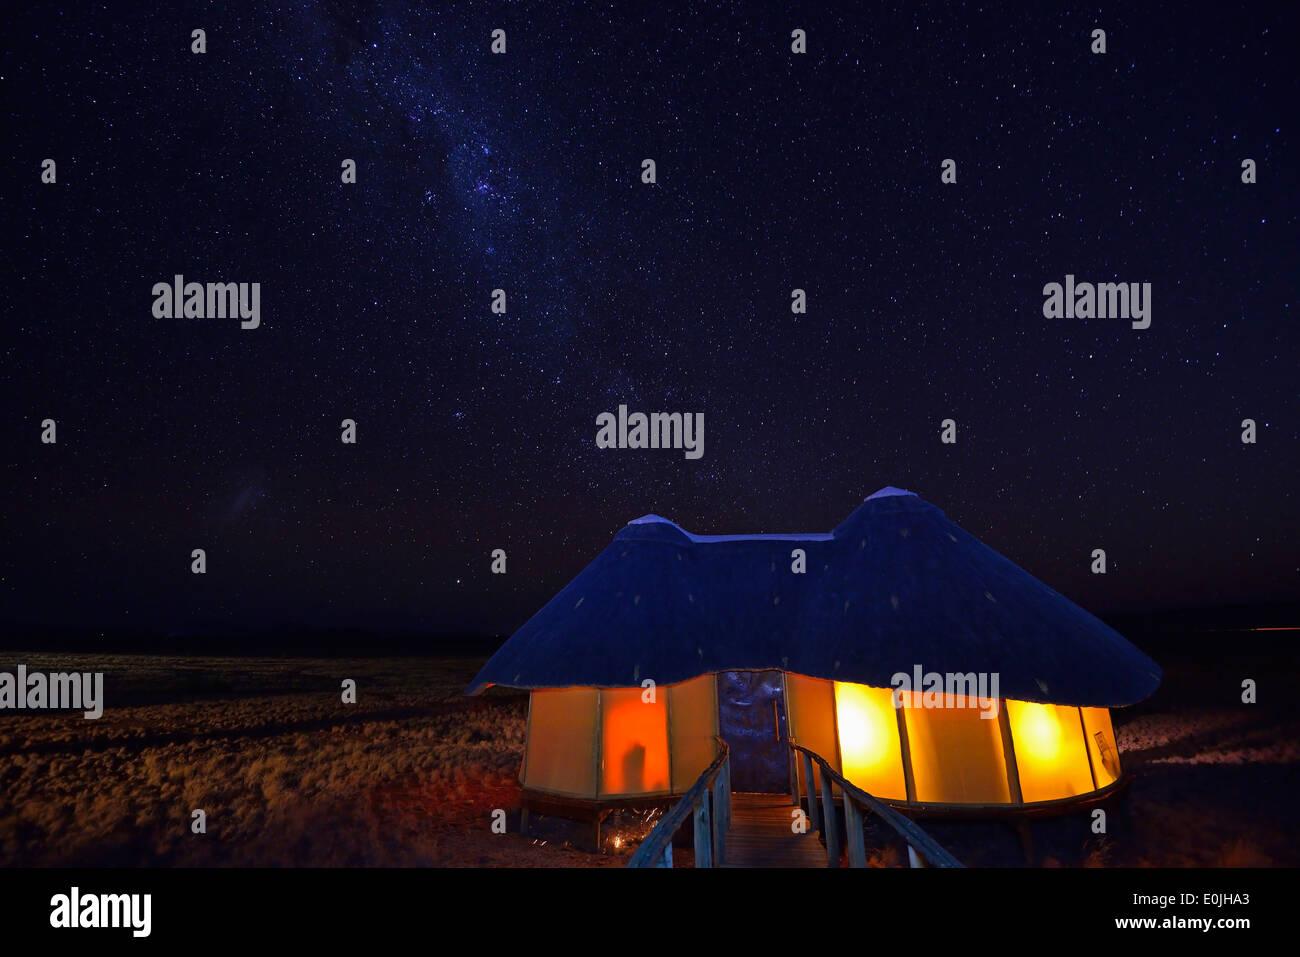 Huetten, Chalets der Sossus Dune Lodge bei Nacht mit Milchstrasse, Namib Naukluft Nationalpark, Sossusvlei, Namibia, Afrika - Stock Image